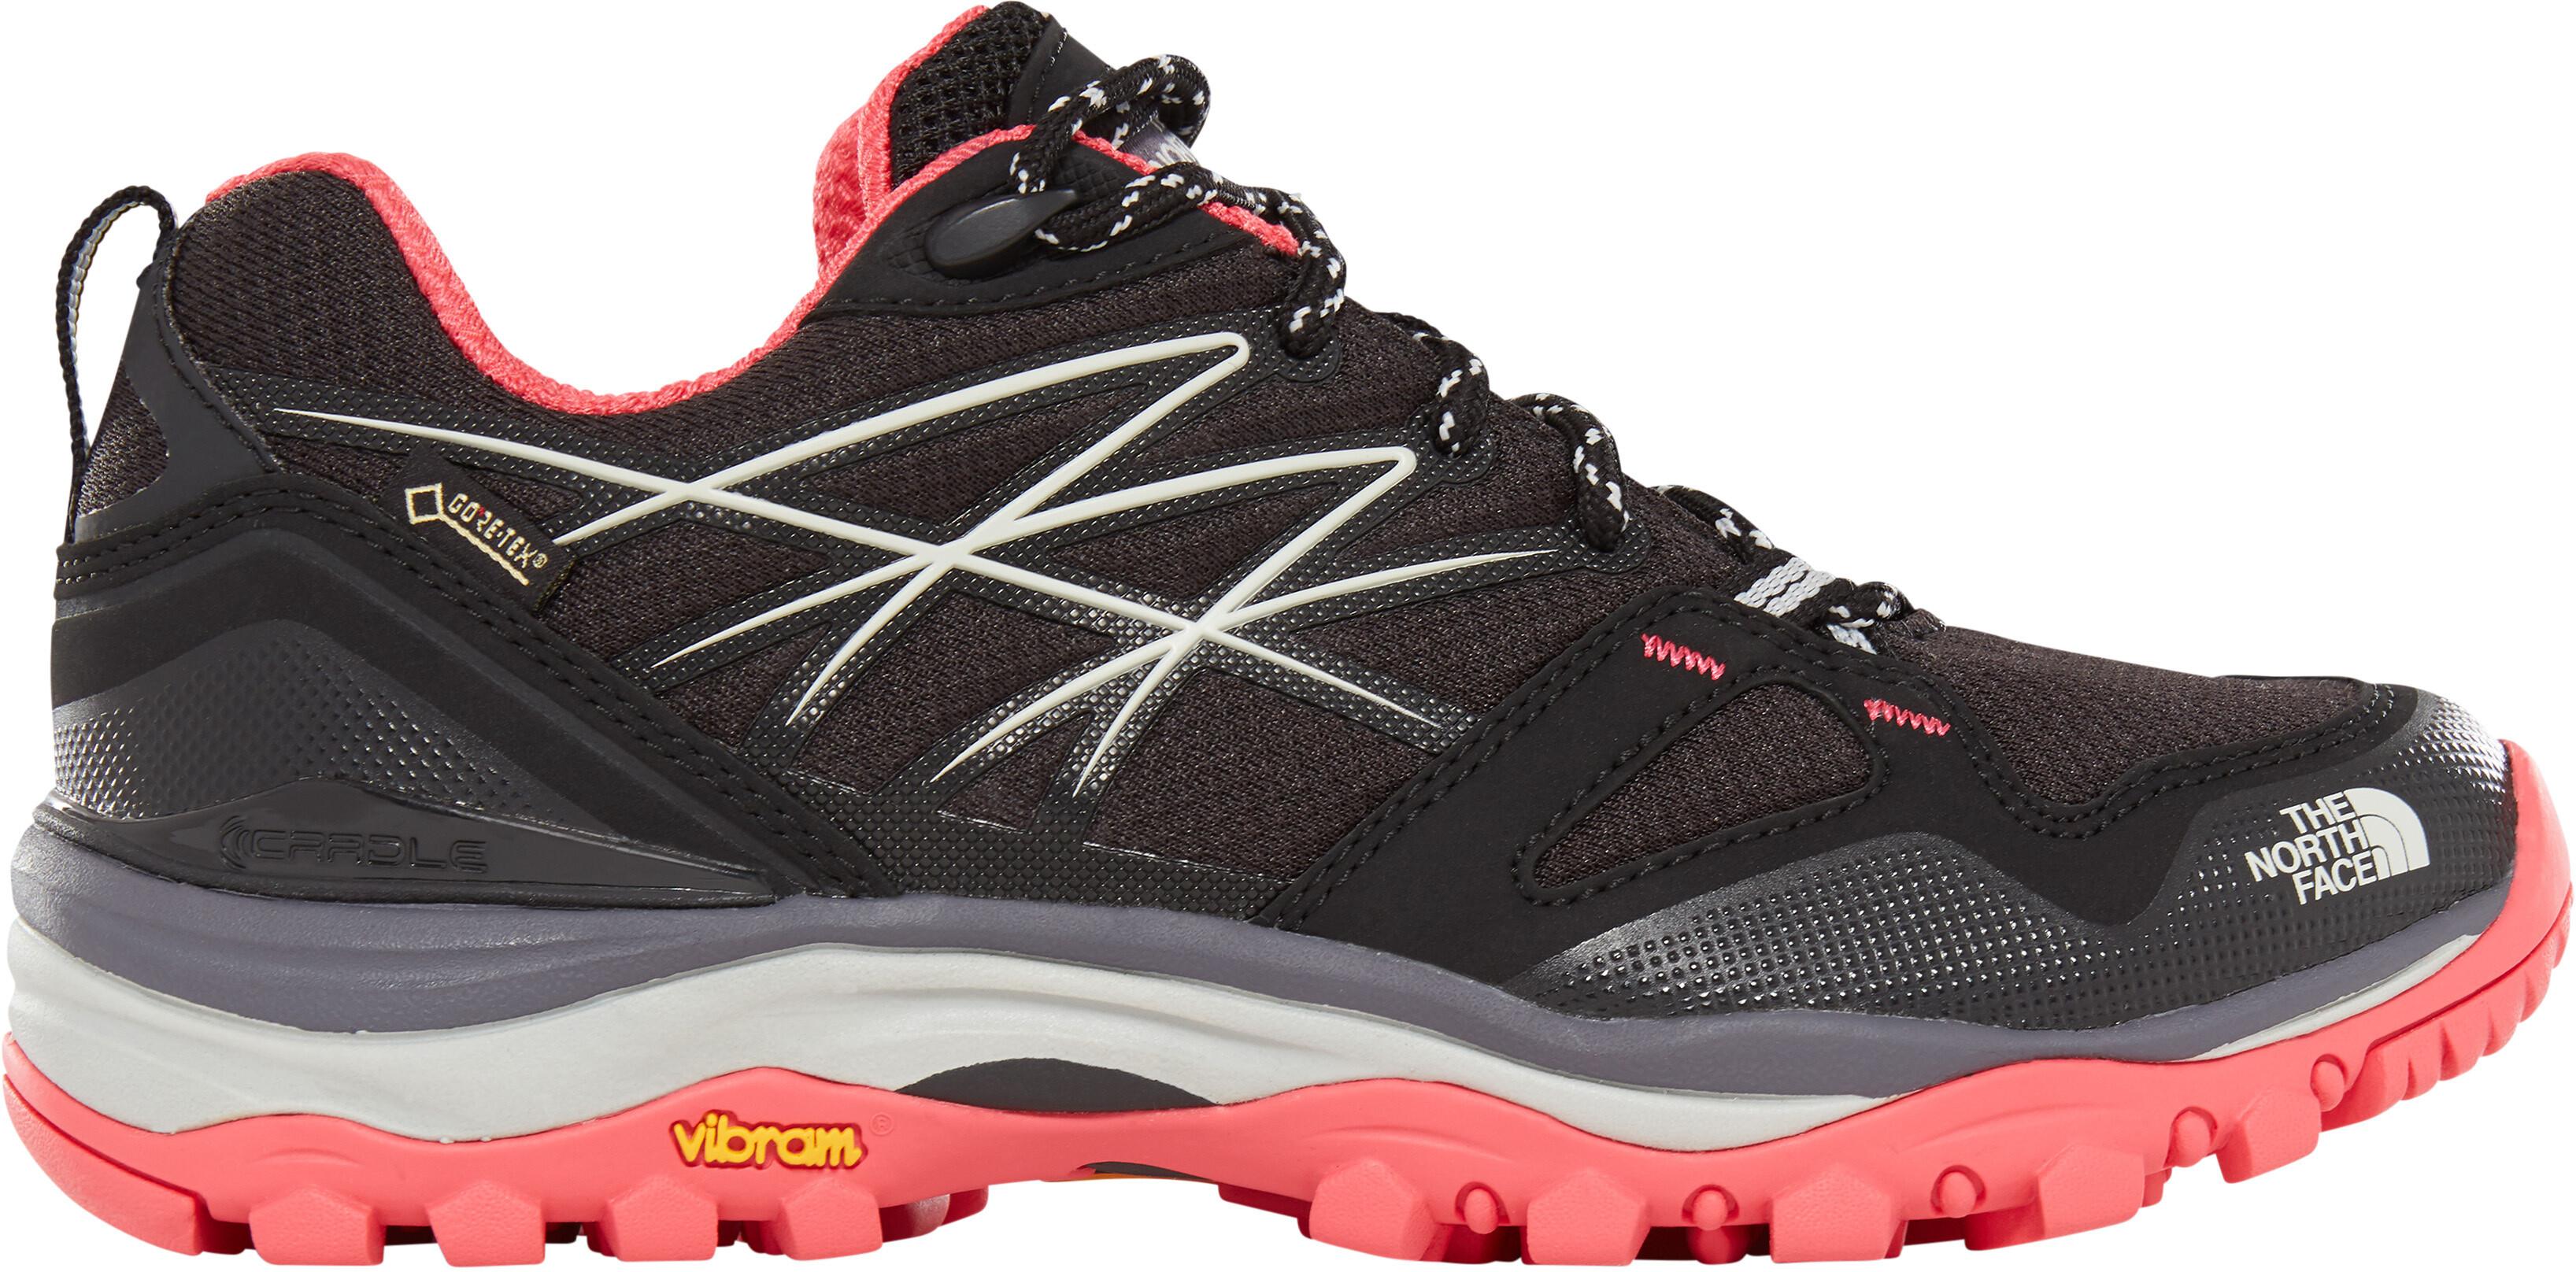 fe31b1d4 The North Face Hedgehog Fastpack GTX Calzado Mujer, tnf black/atomic pink